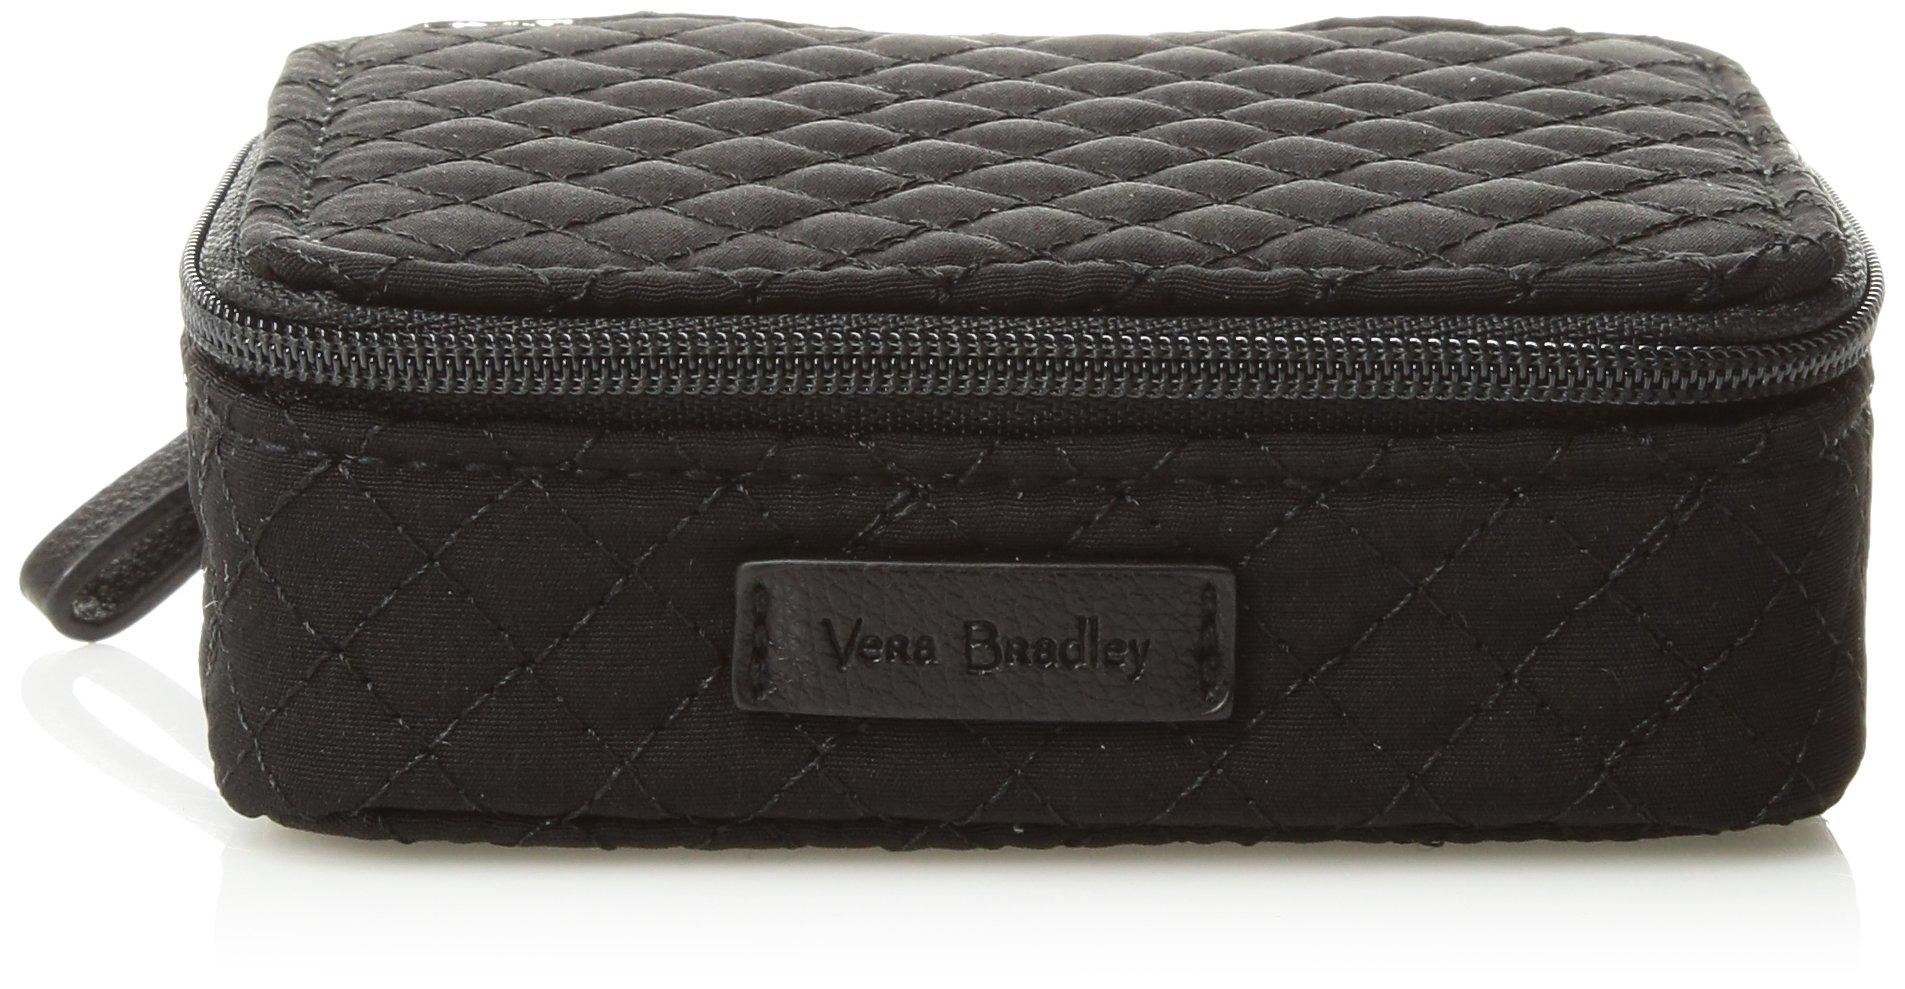 Vera Bradley Iconic Travel Pill Case Vv, Classic Black